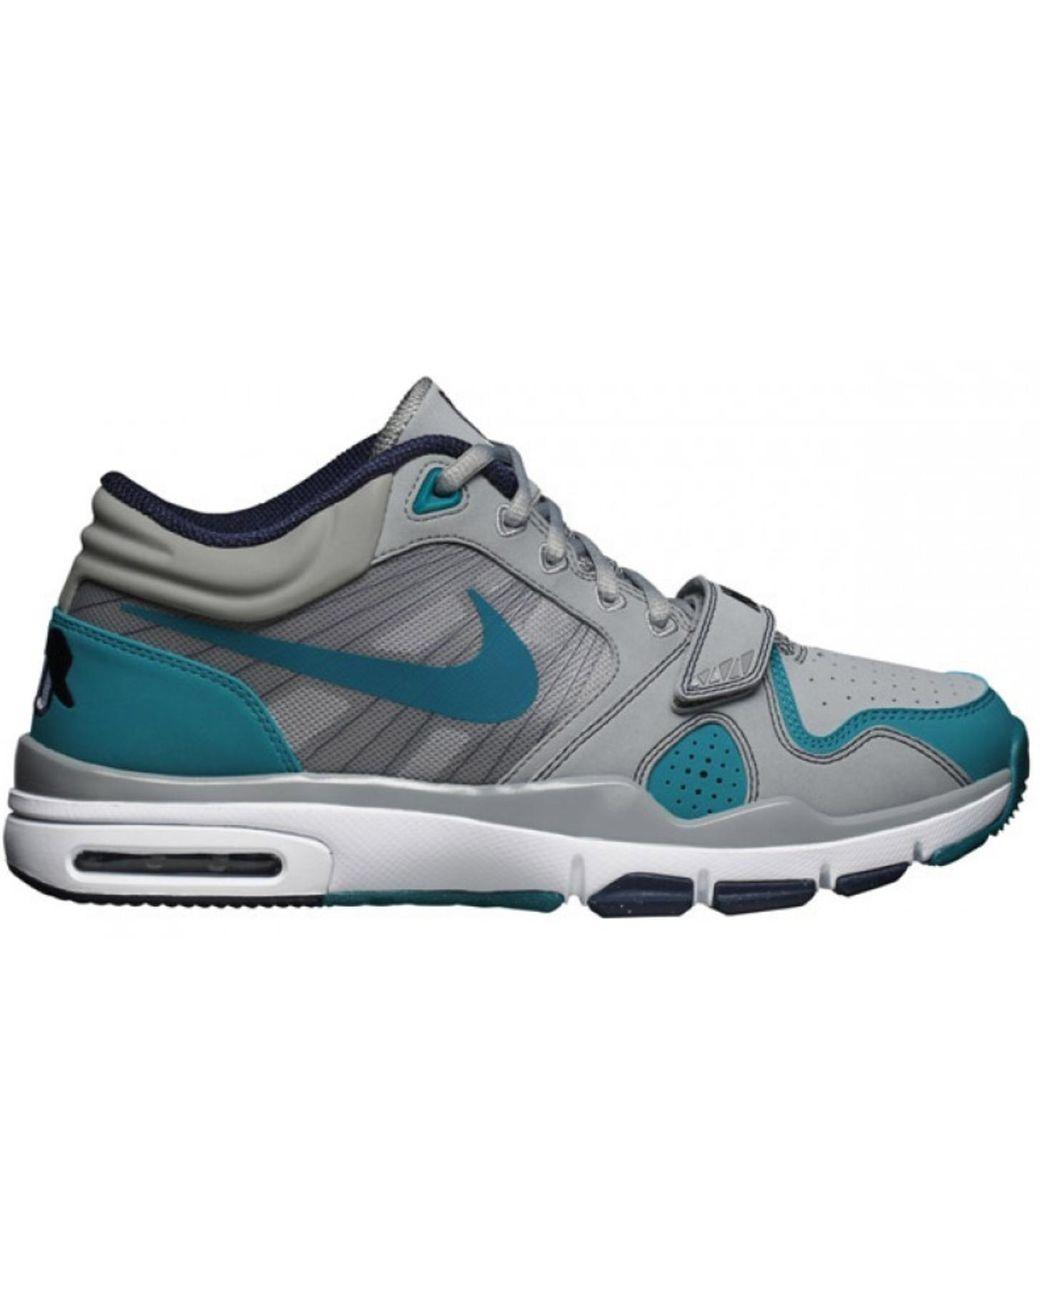 brand new 8fa0e 5cb61 Men's Gray Sneaker 1.2 Mid Ken Griffey Jr. 600